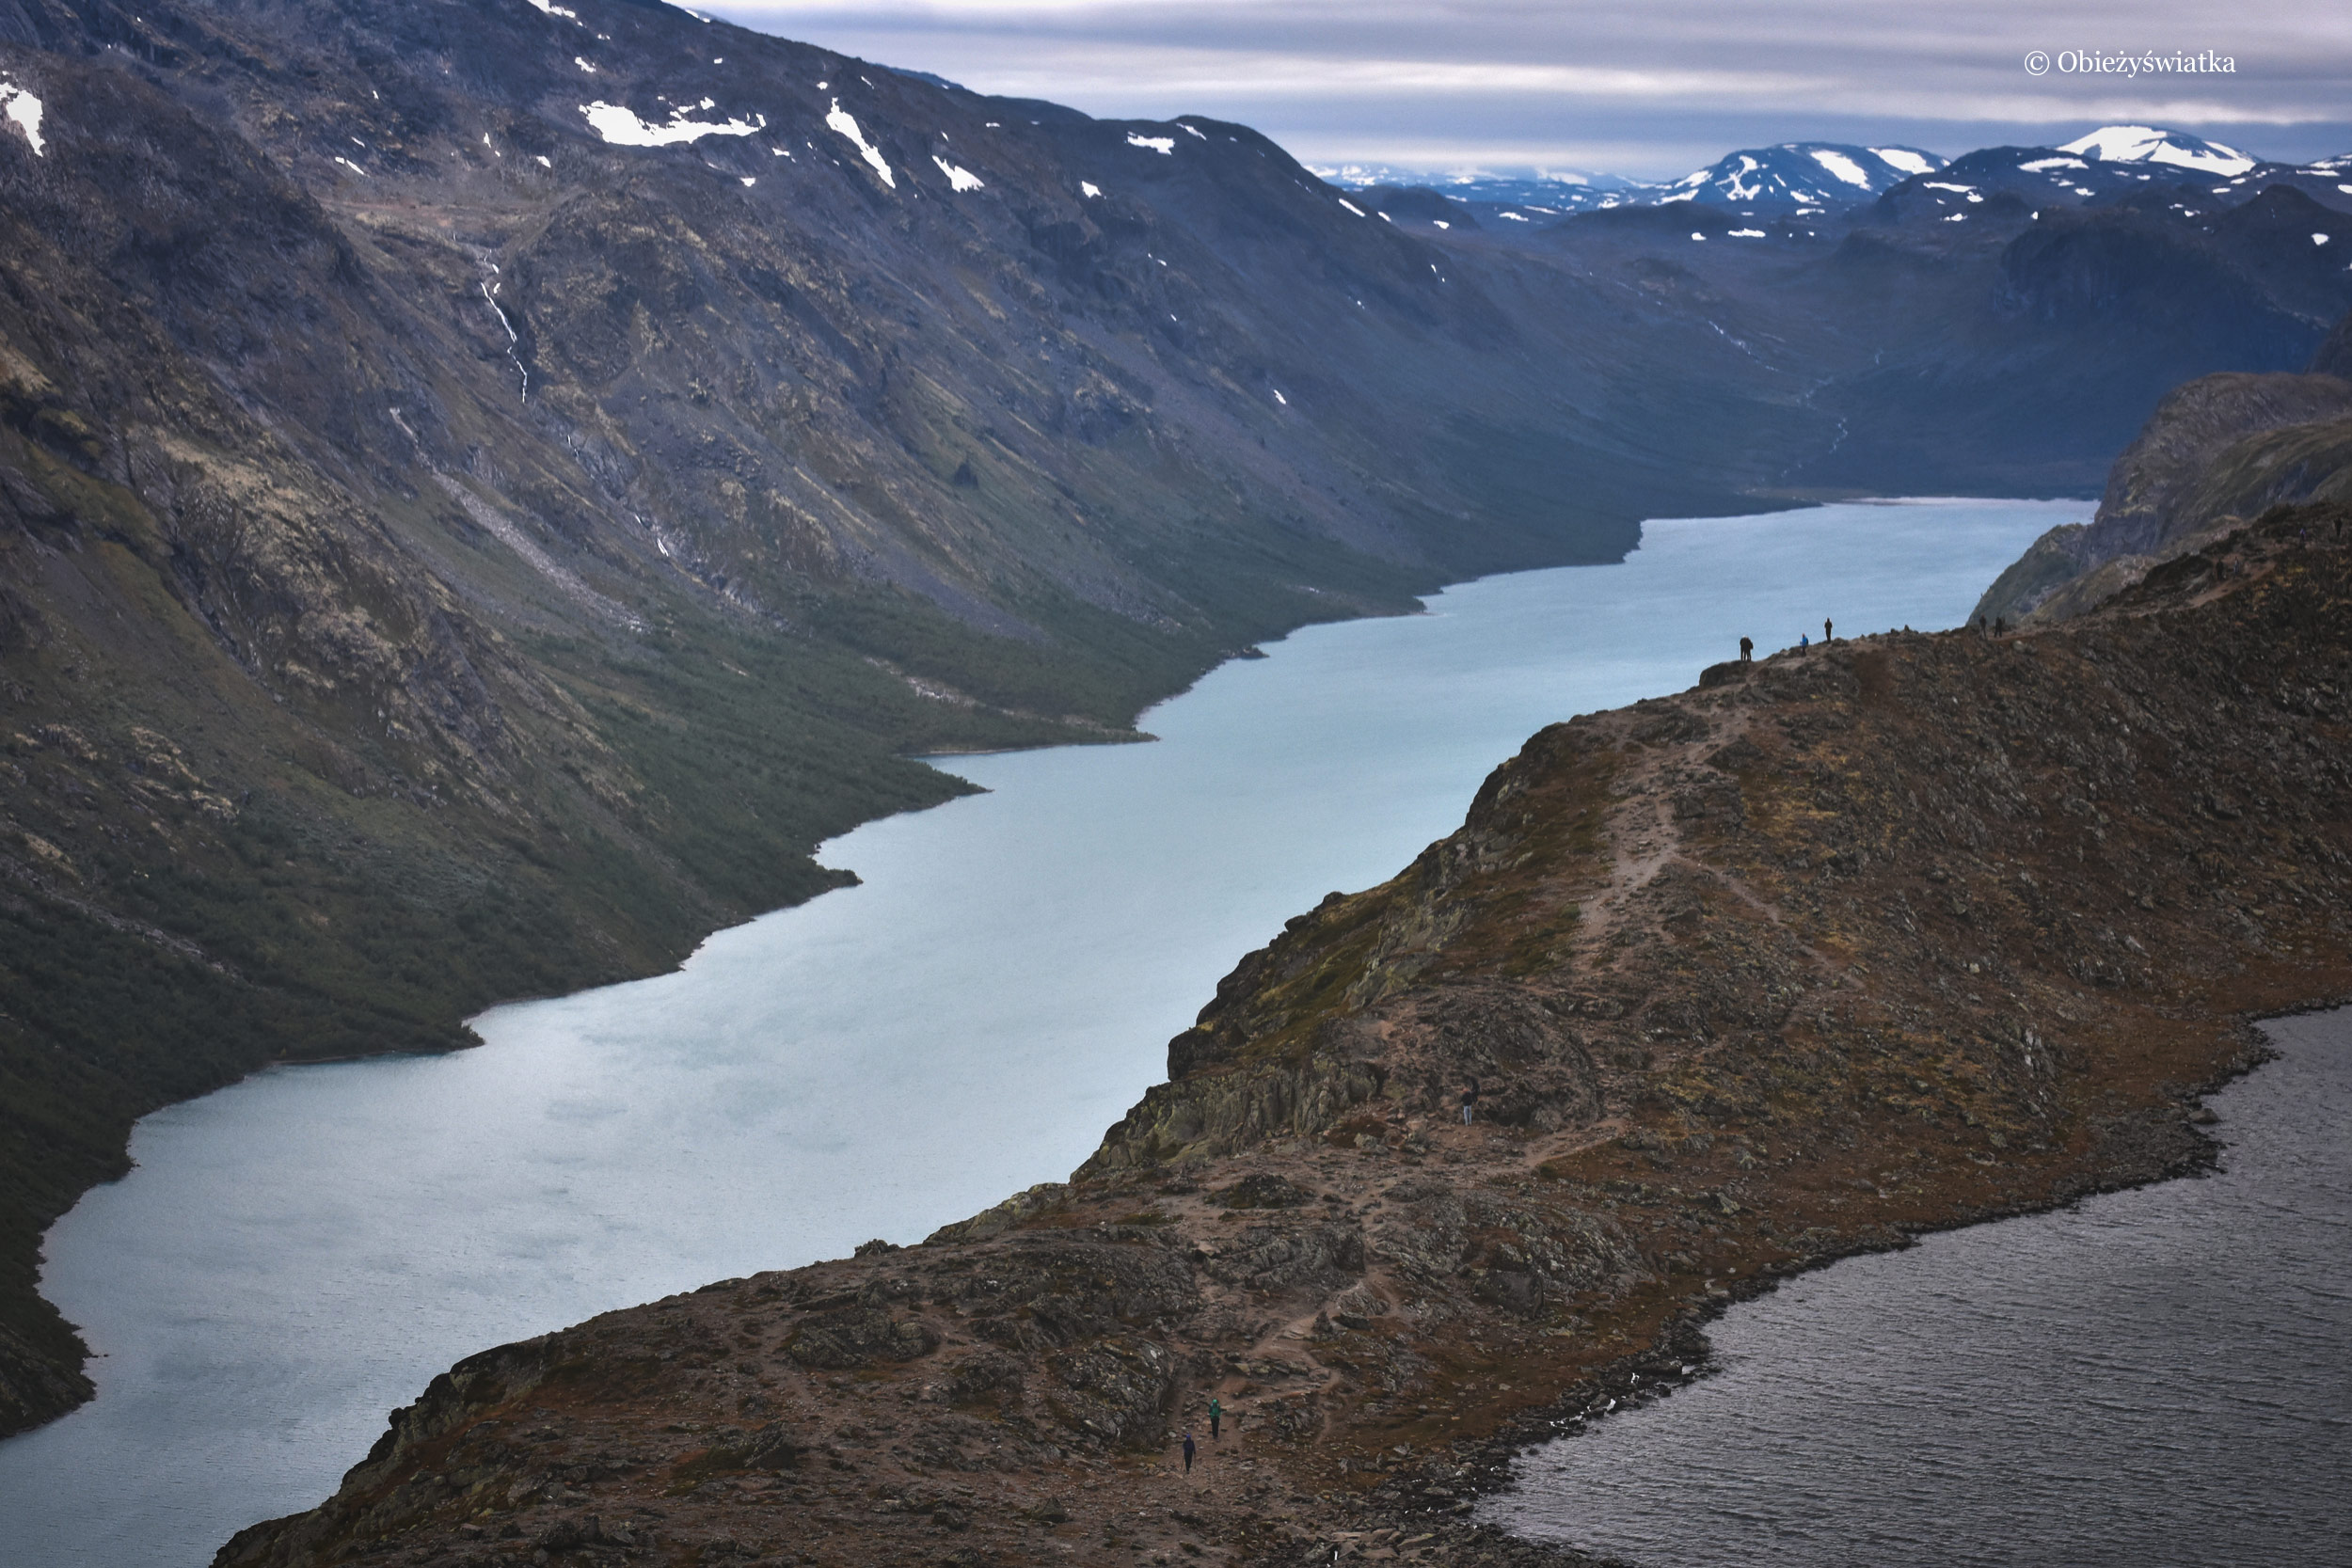 Dwa jeziora - Gjende i Bessvatnet